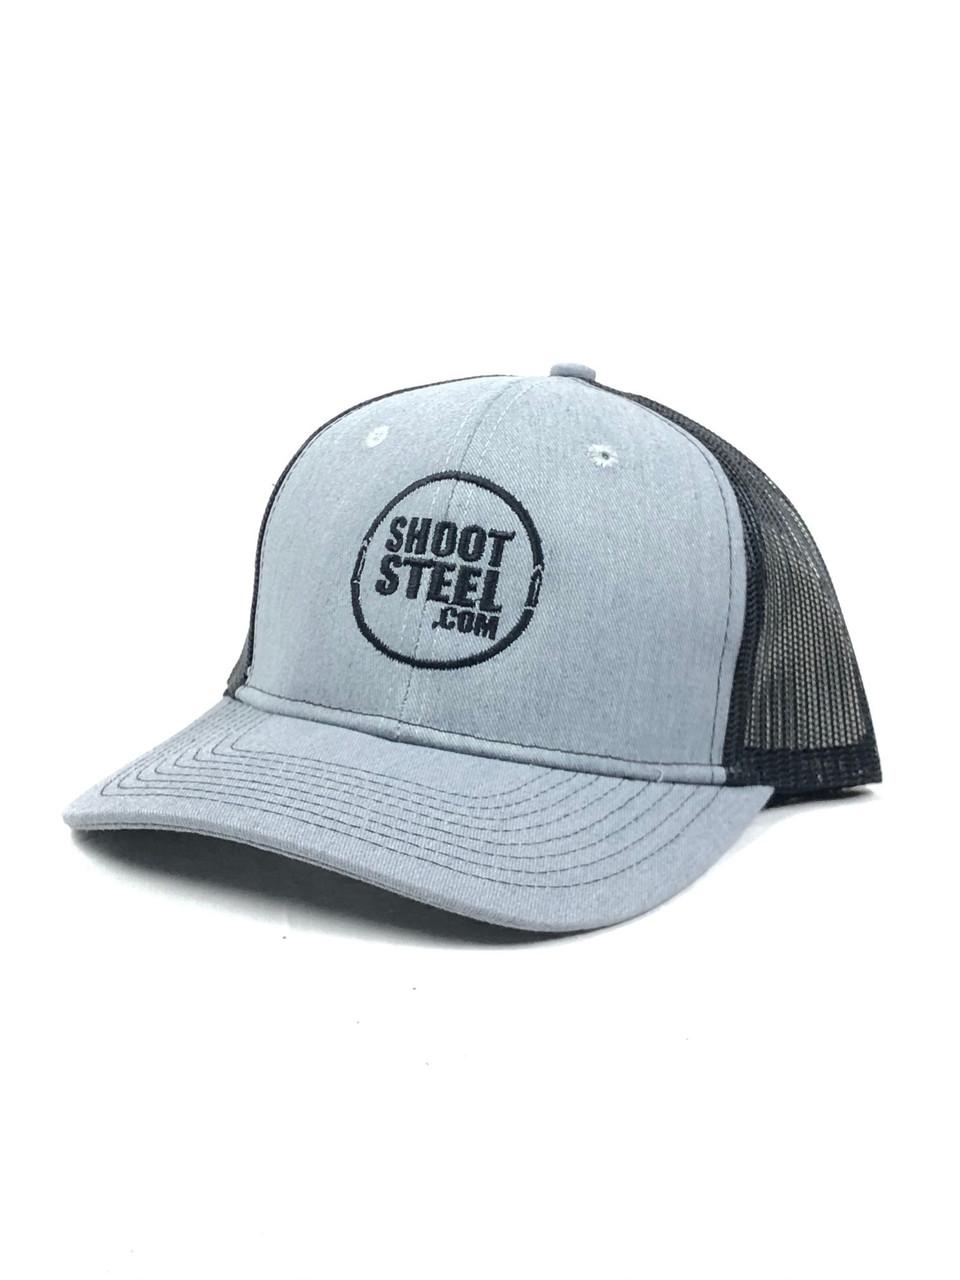 ShootSteel Black/Grey Snap Back Trucker Hat